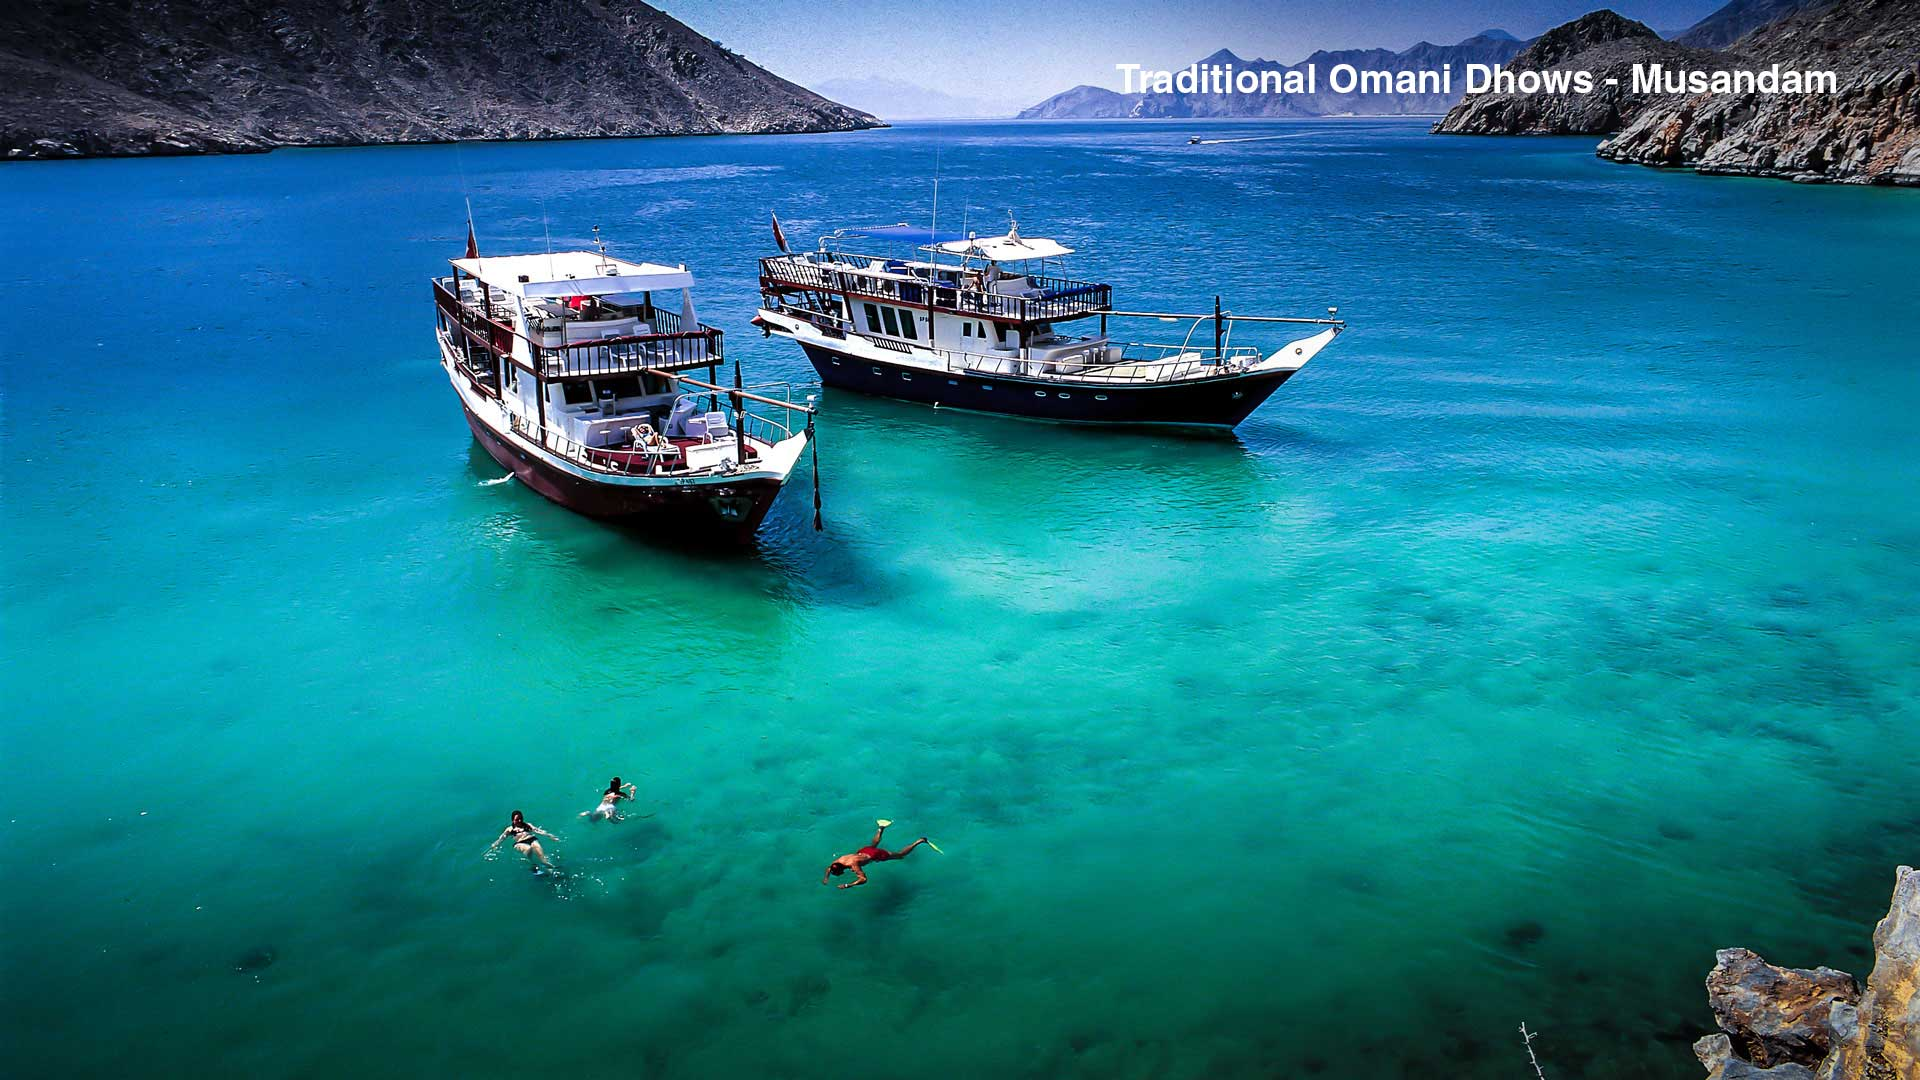 Traditional-Omani-Dhows---Musandam